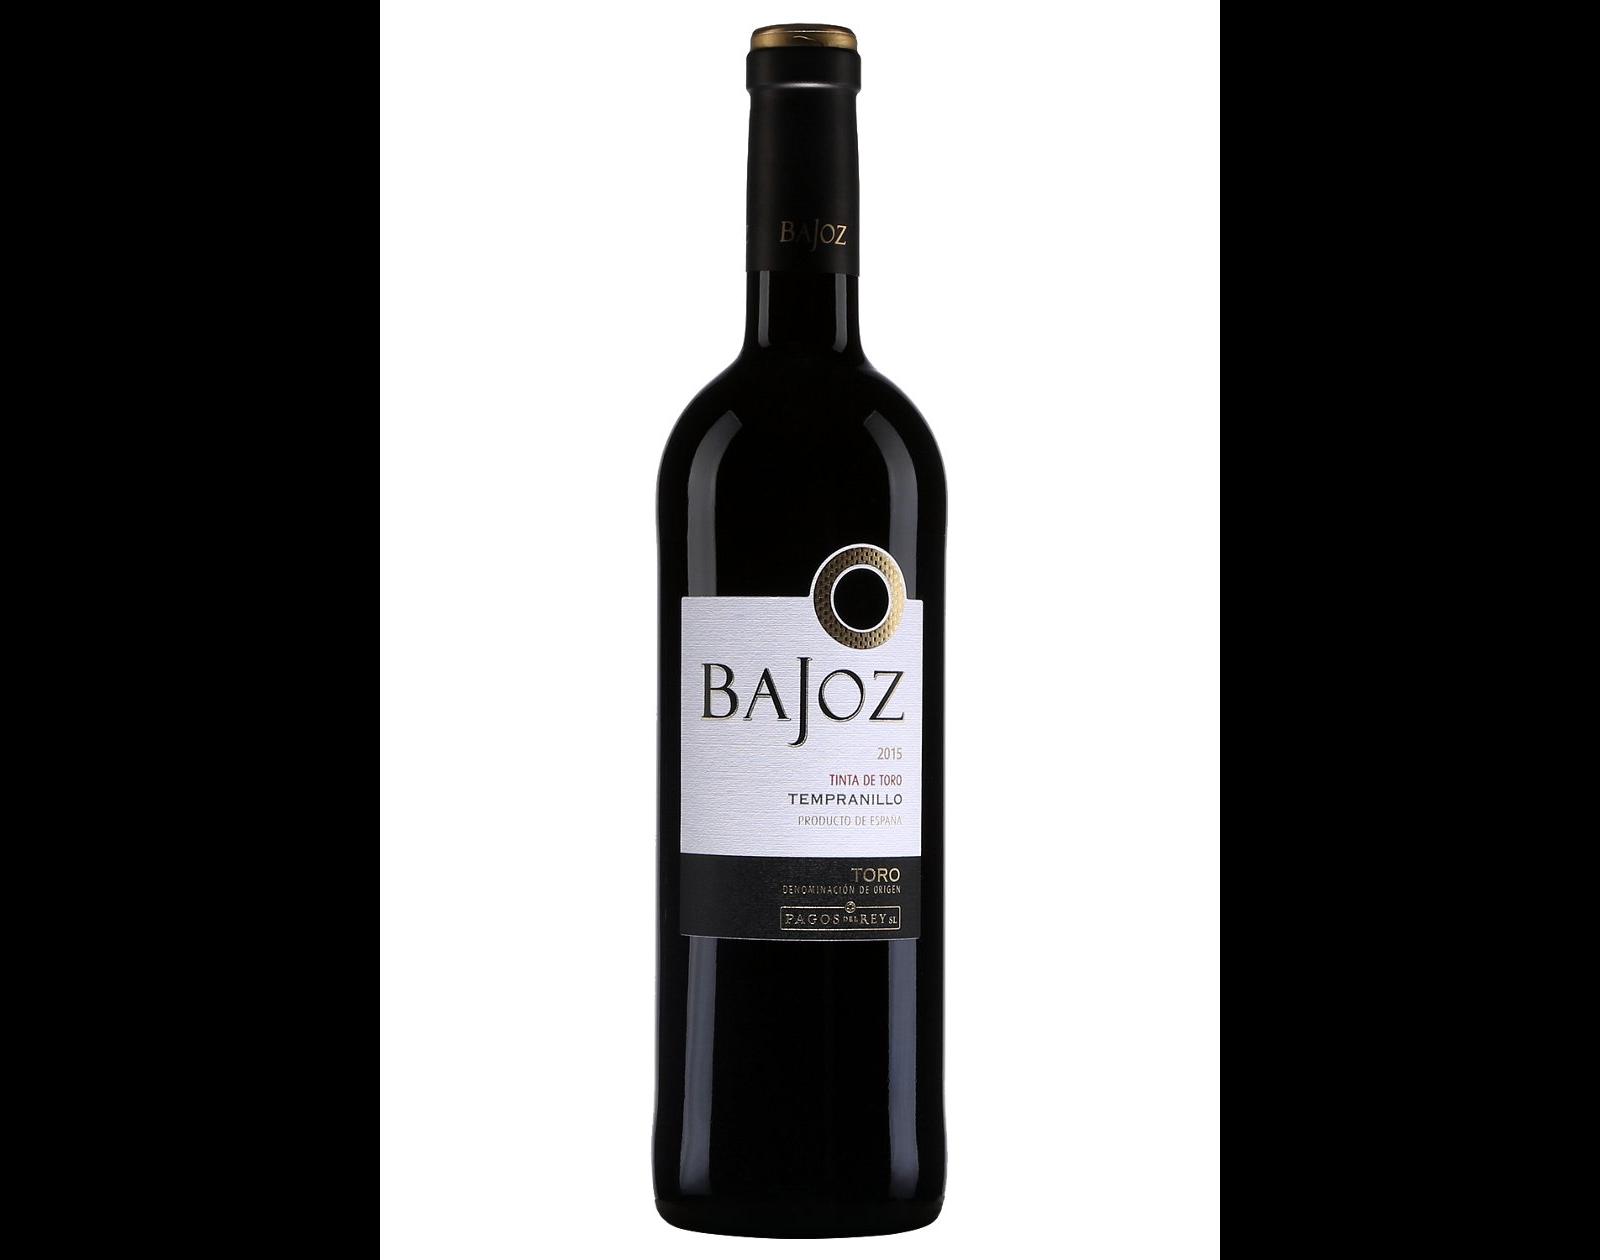 bouteille de vin rouge Bajoz Toro 2018